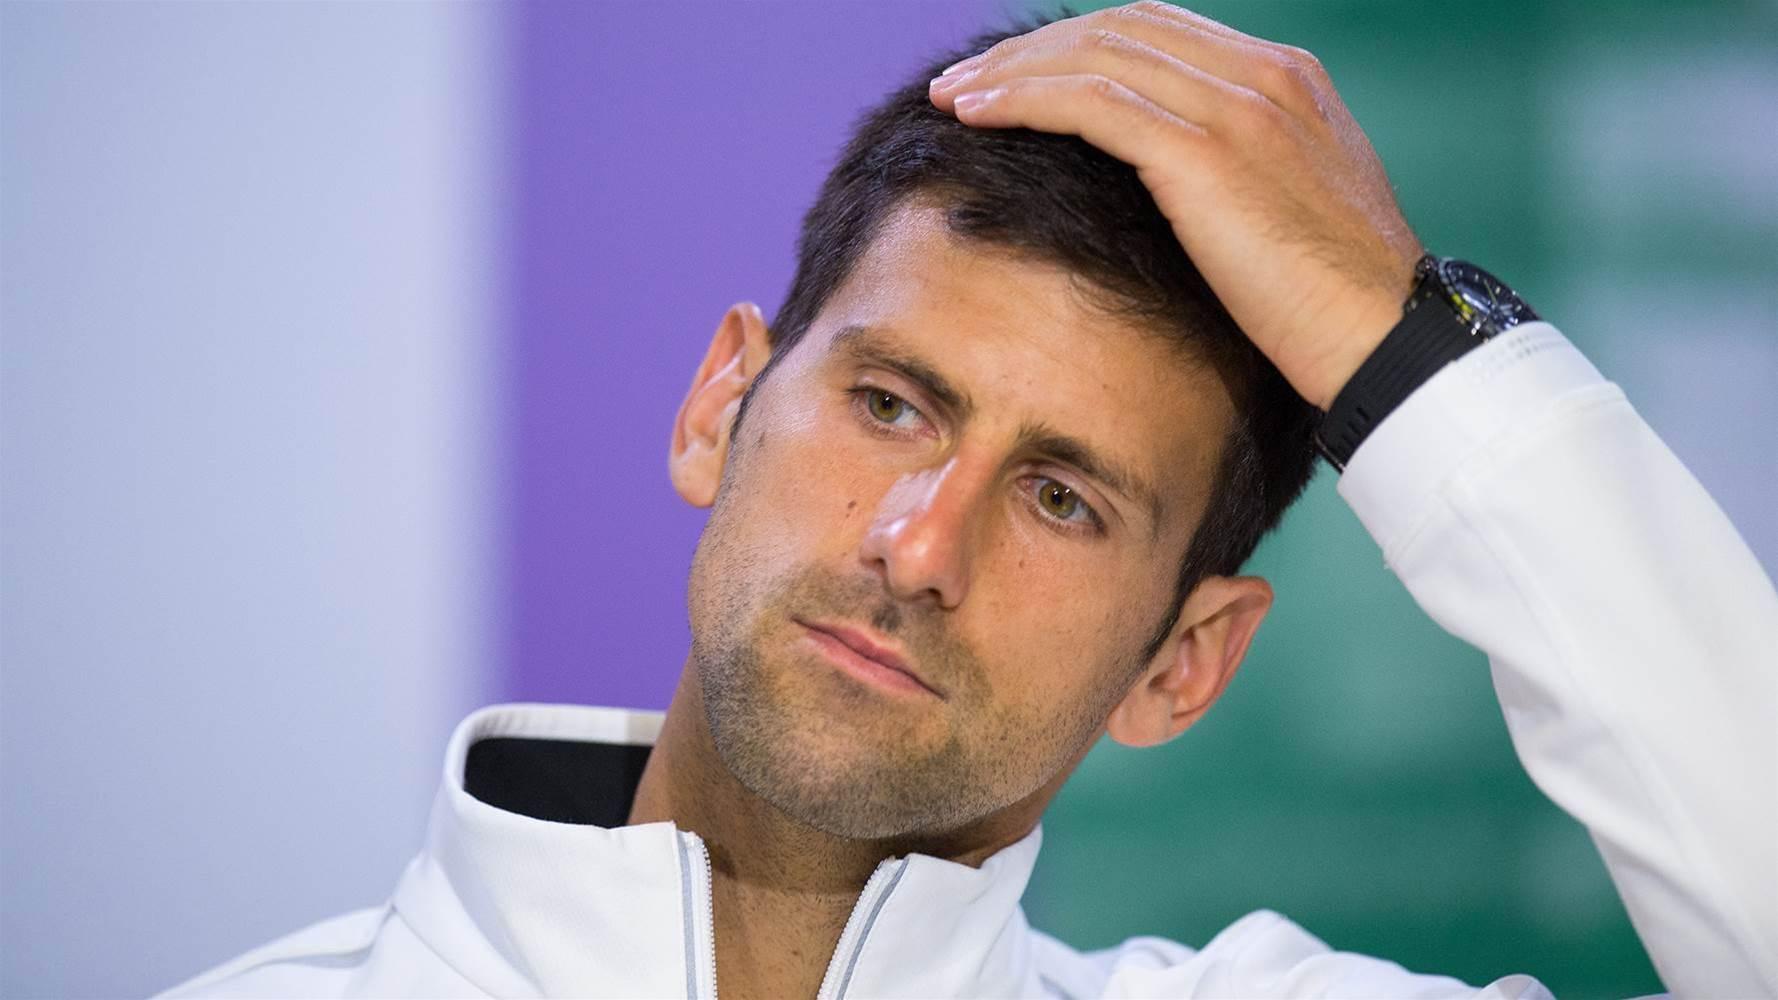 Djokovic won't play again in 2017